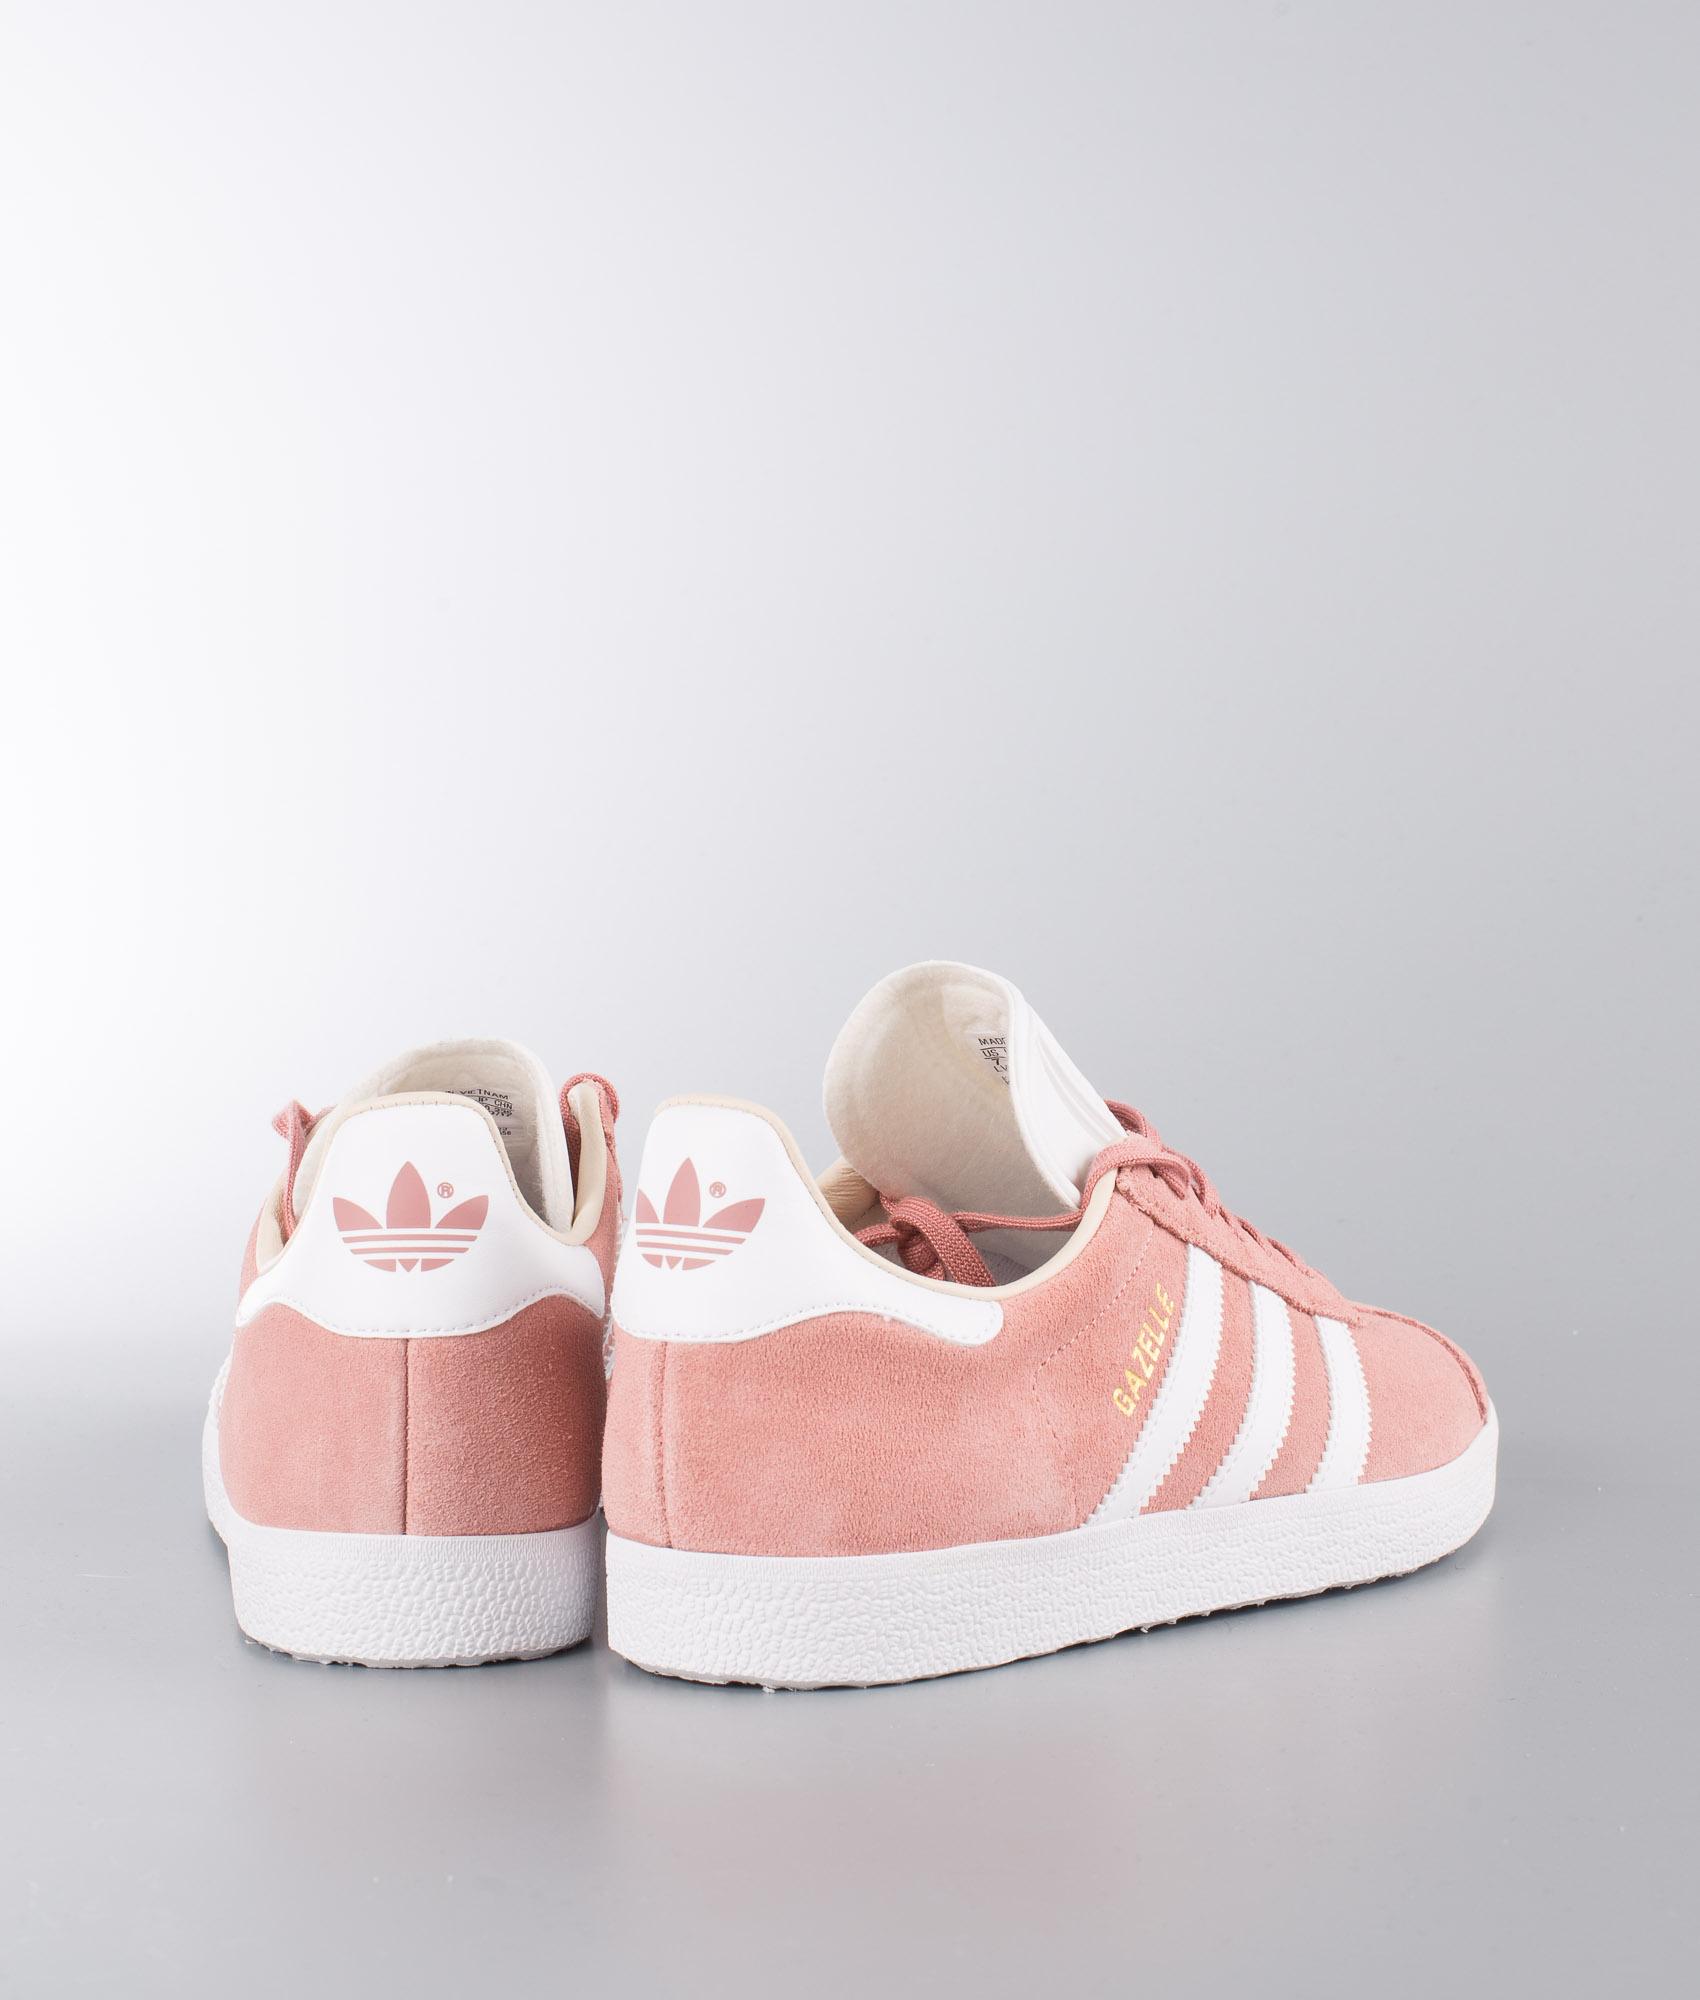 Schuhe Originals Gazelle WhiteLinen Adidas Ash PinkFtwr K1lJcuTF35